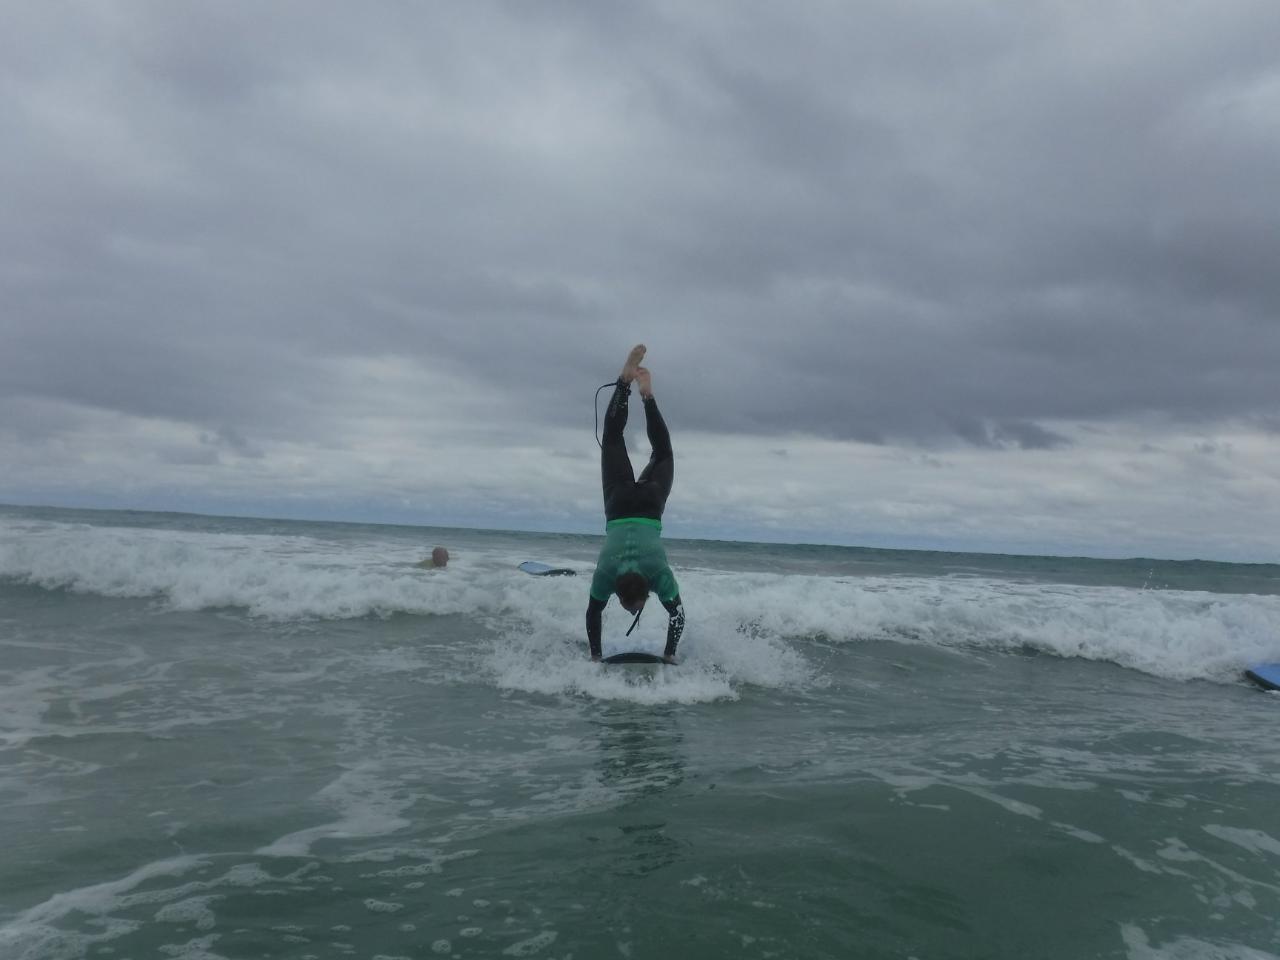 Surfboard Hire